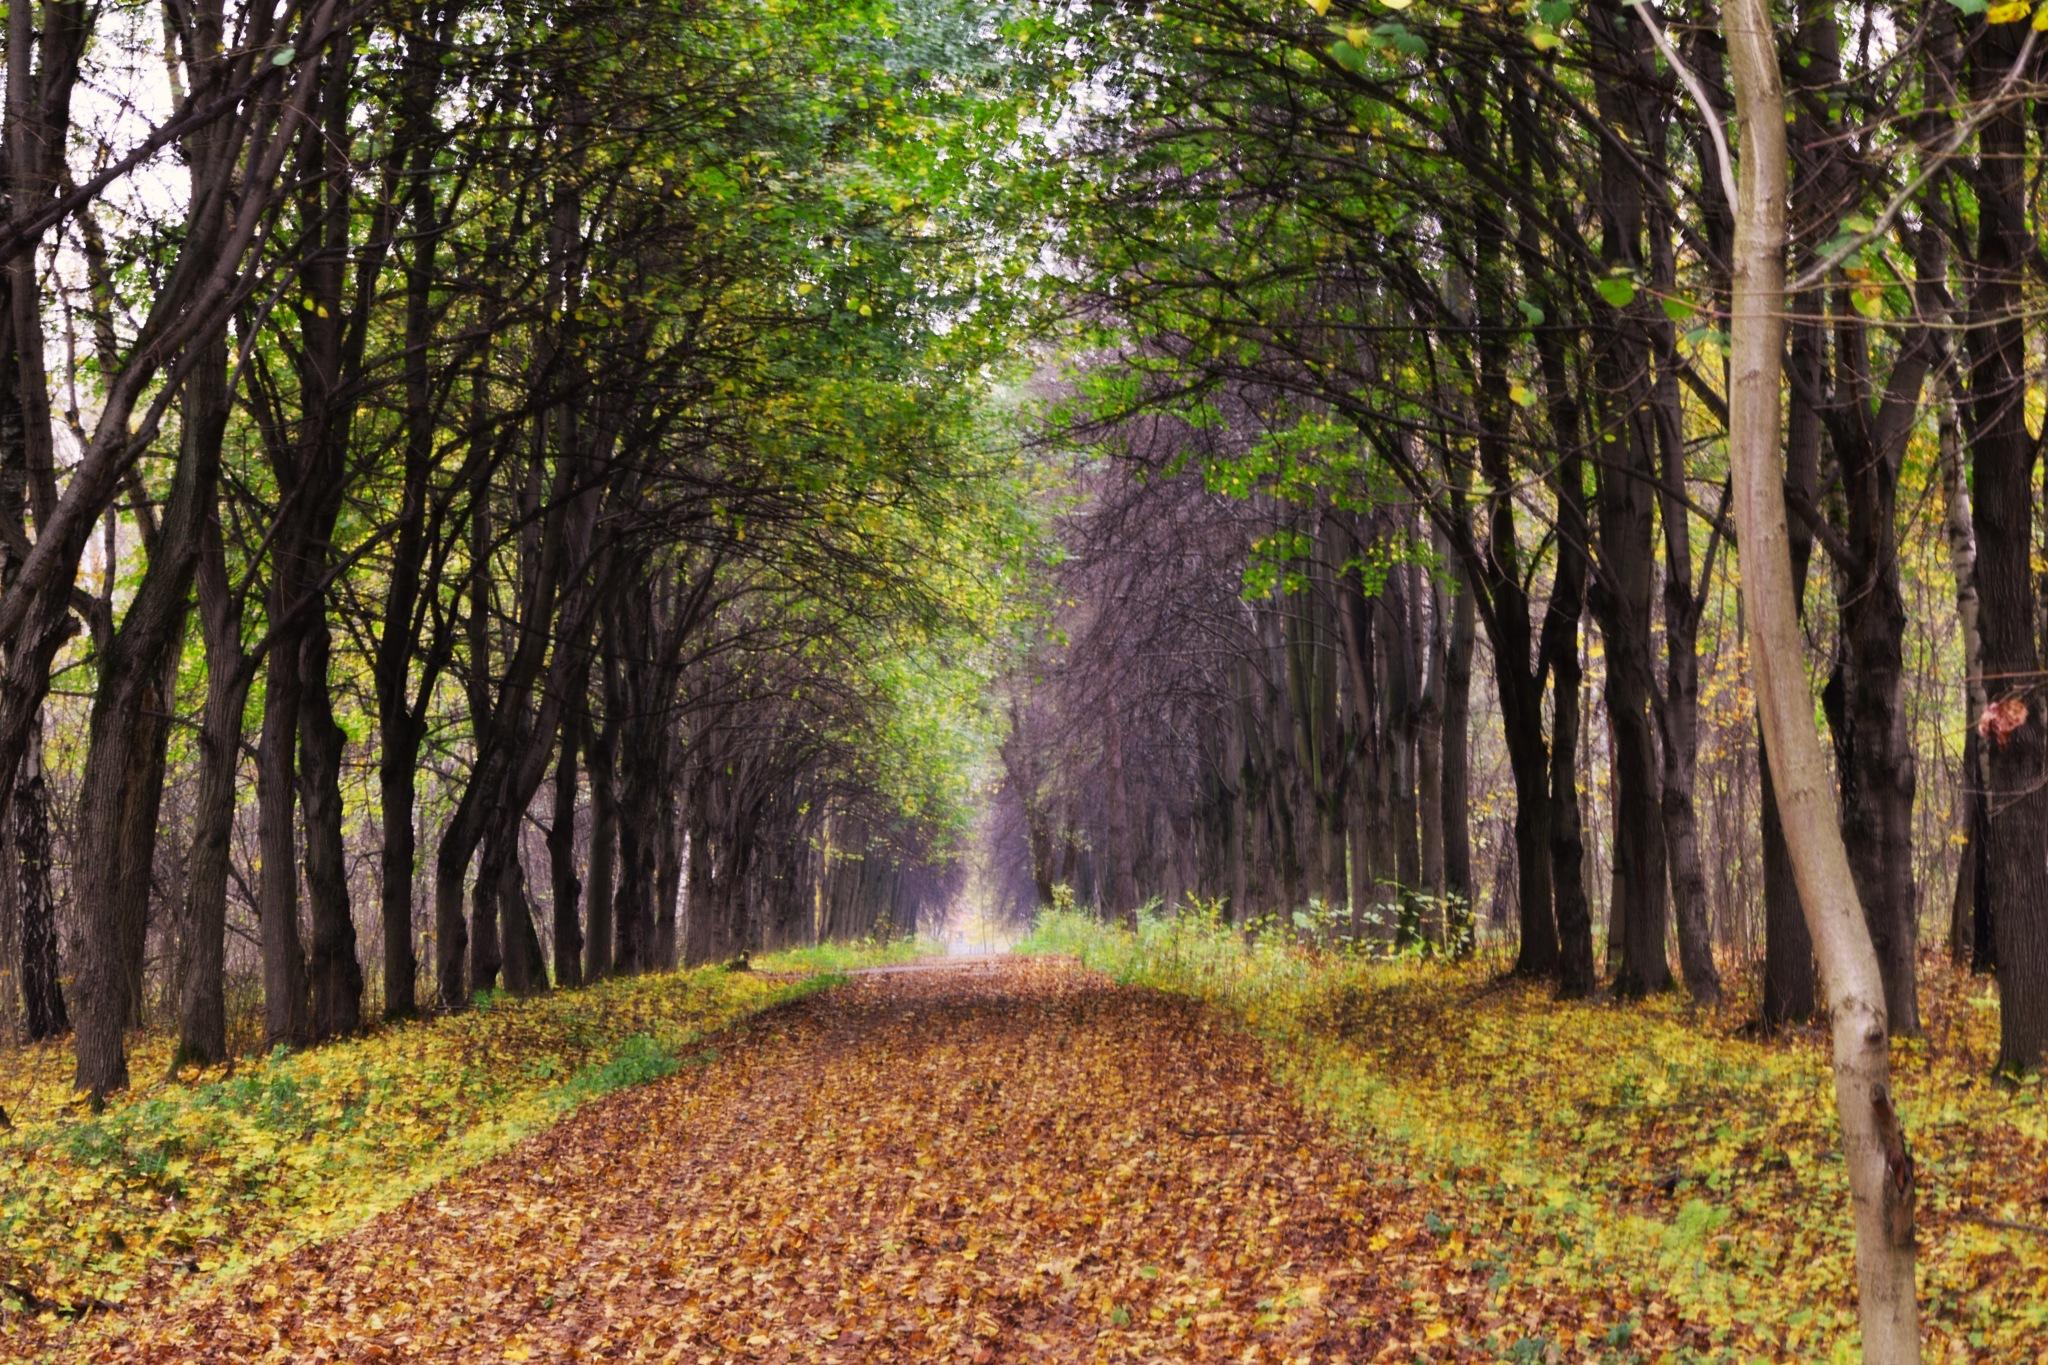 Photo in Landscape #haze #autumn #landscape #nikon #warm #evening #shady alley #moscow #tree #walkway #nature #park #fallen leaves #colors #парк #опавшая листва #природа #осень #краски #москва #прогулочная дорожка #дерево #вечер #тенистая аллея #дымка #пейзаж